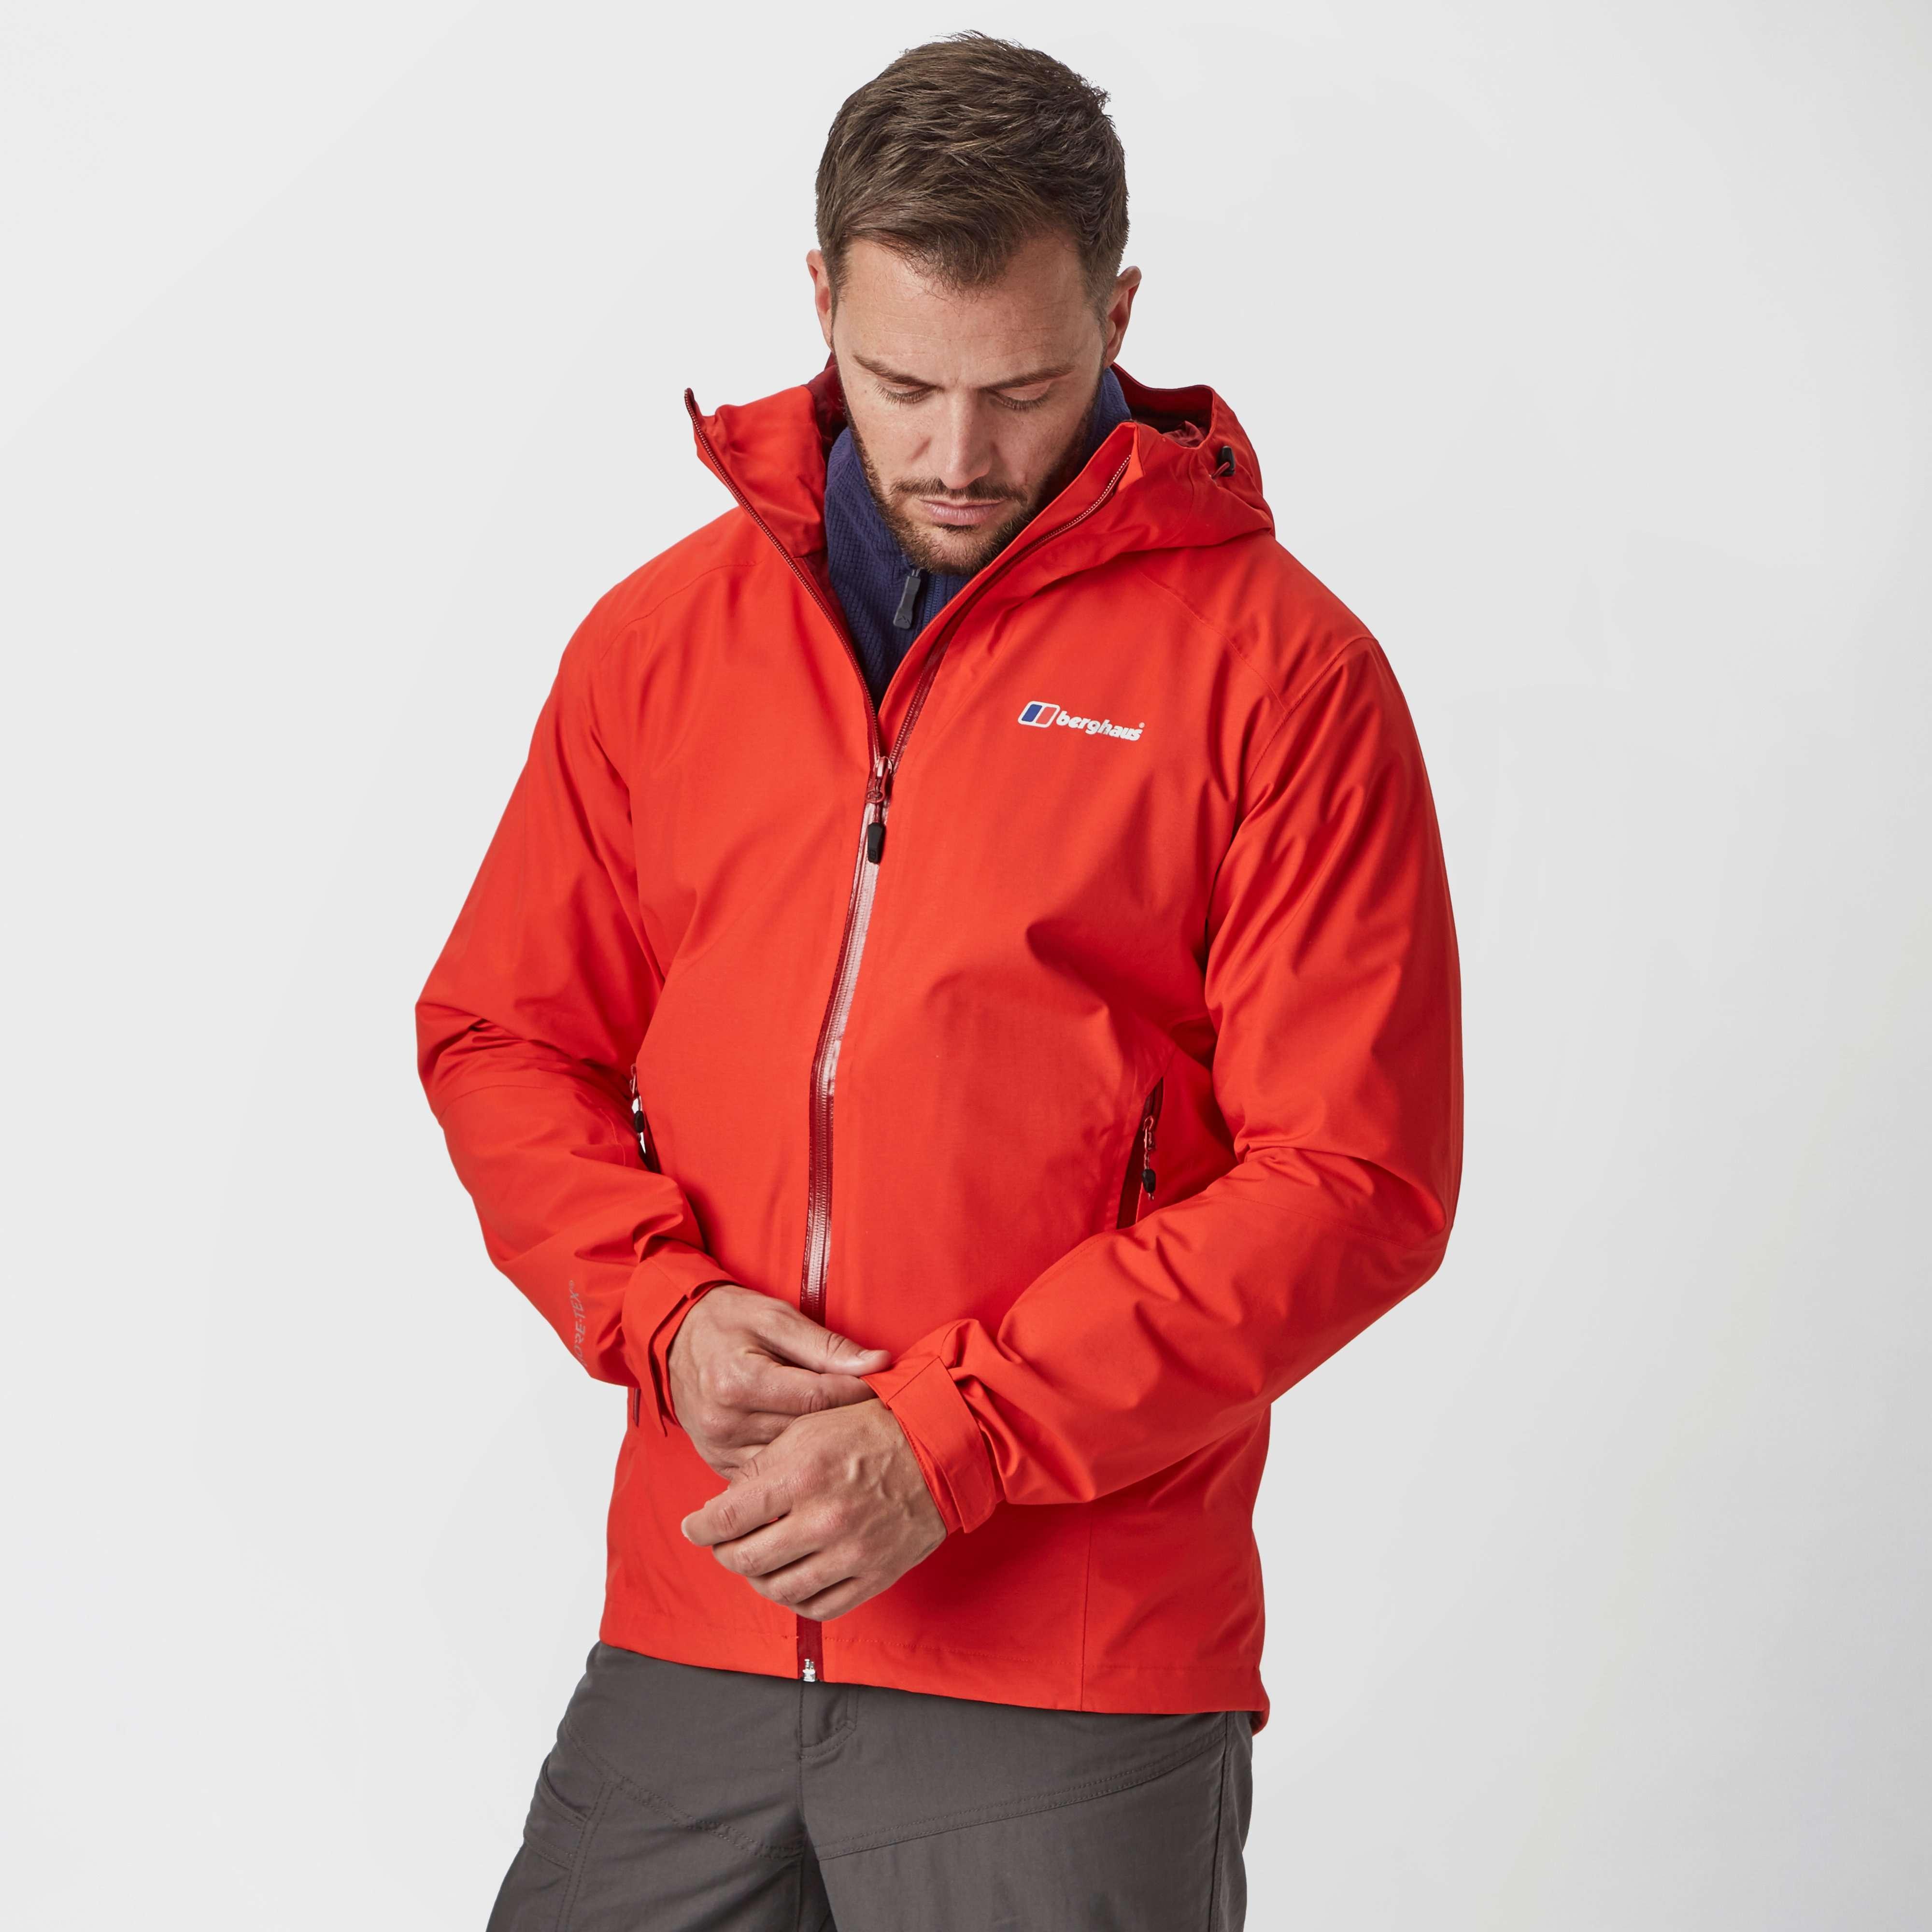 BERGHAUS Men's Ridgemaster GORE-TEX® Jacket